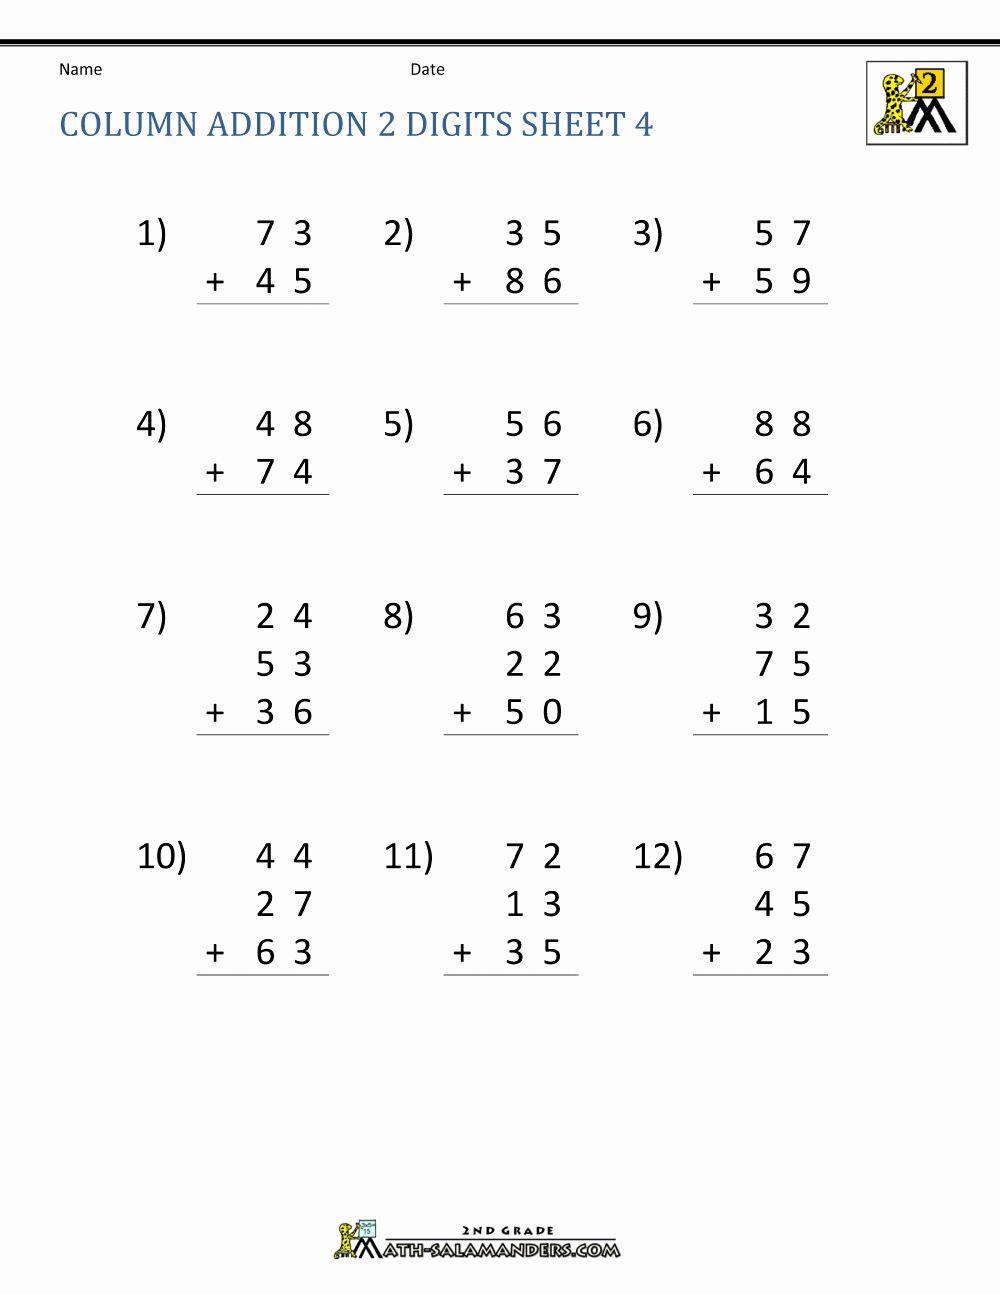 Worksheets Column Addition 4 Digit Numbers Addition Worksheets First Grade Addition Worksheets Column Addition Digit column addition without